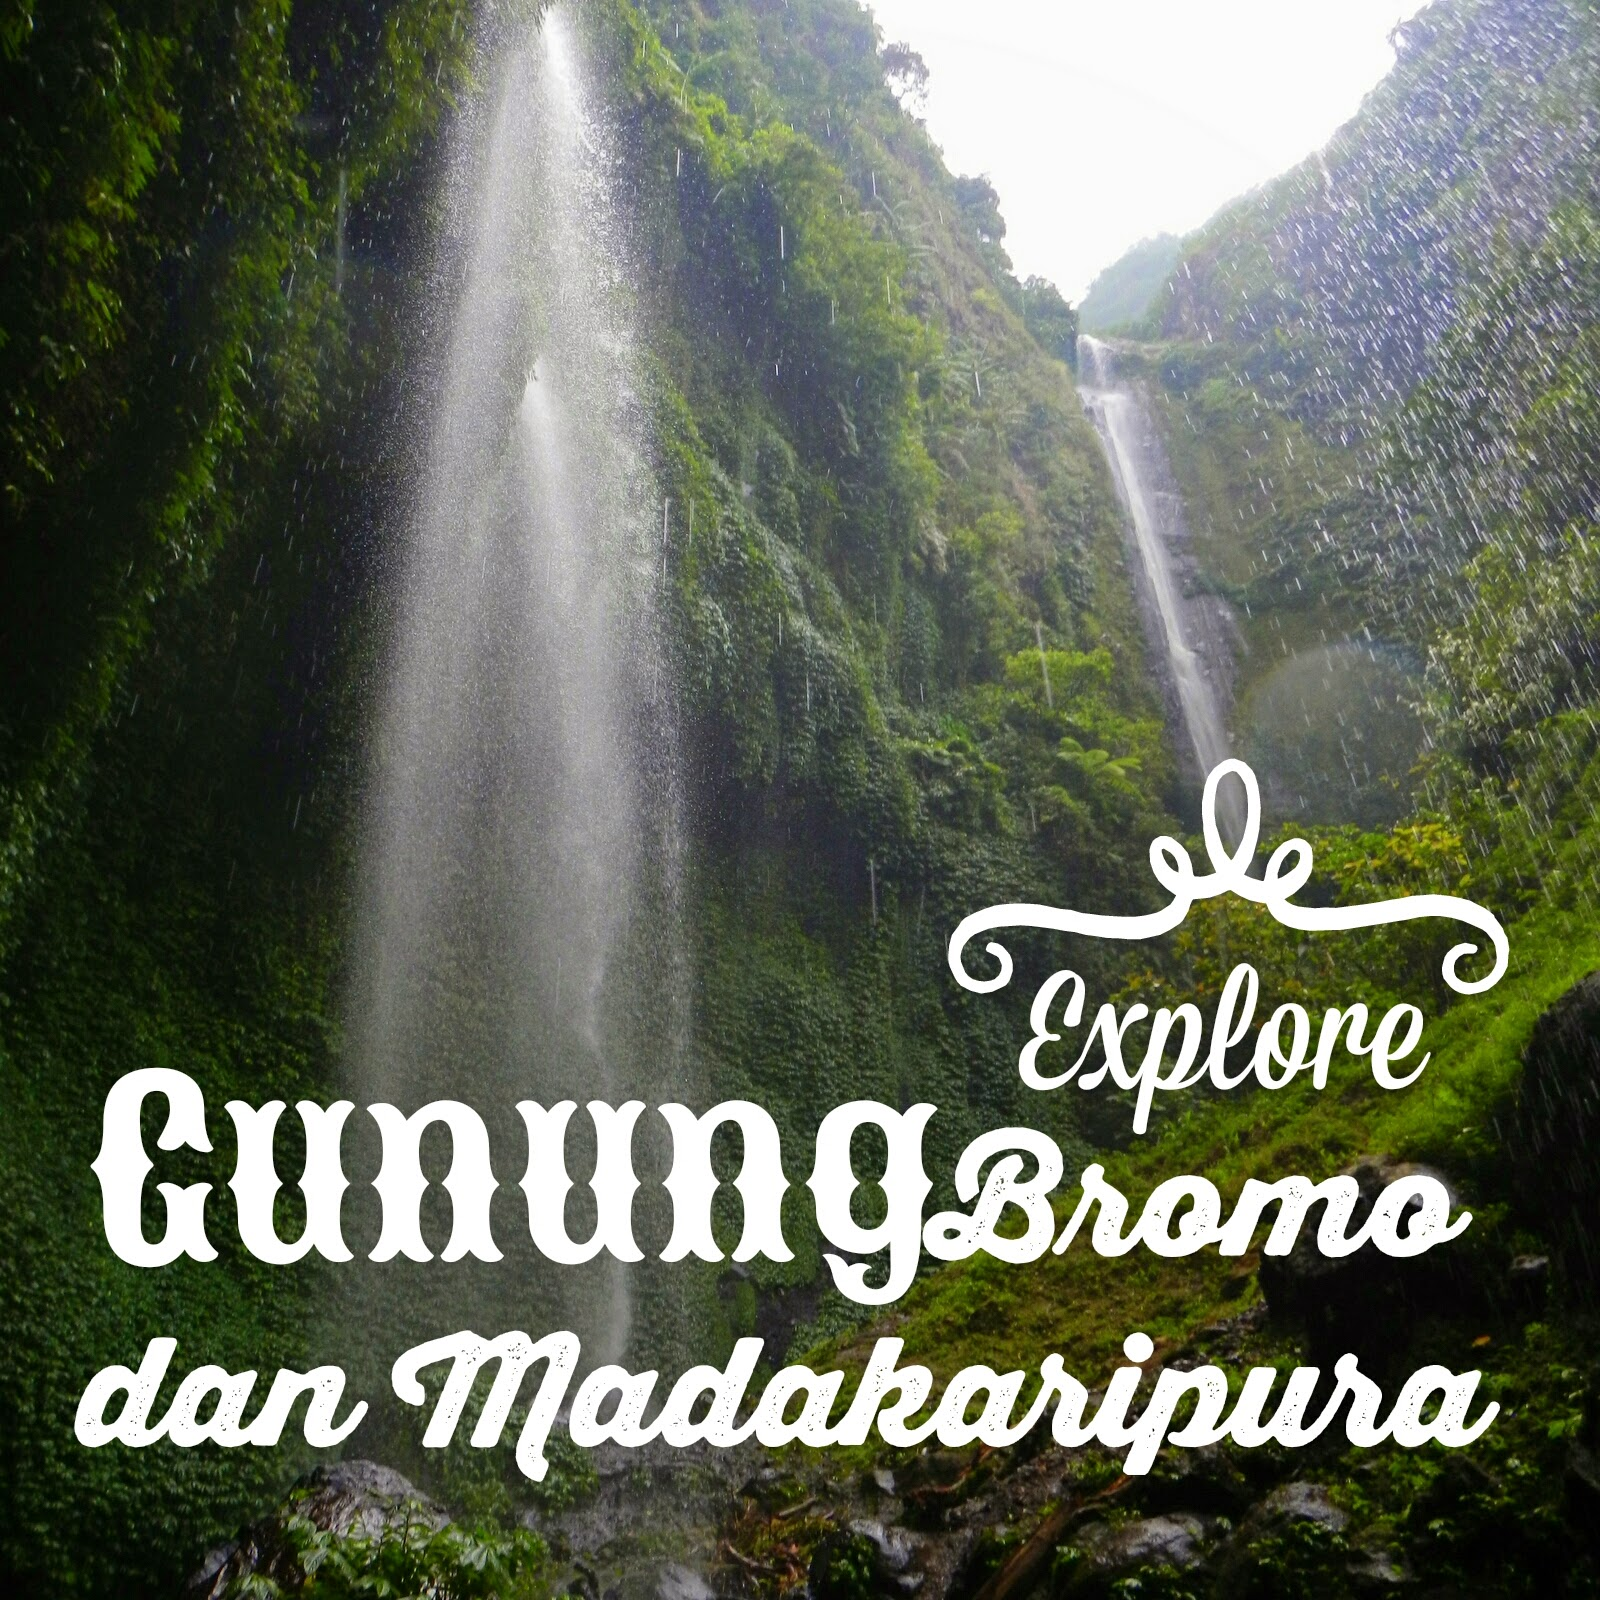 Madakaripuran dan Gunung Bromo